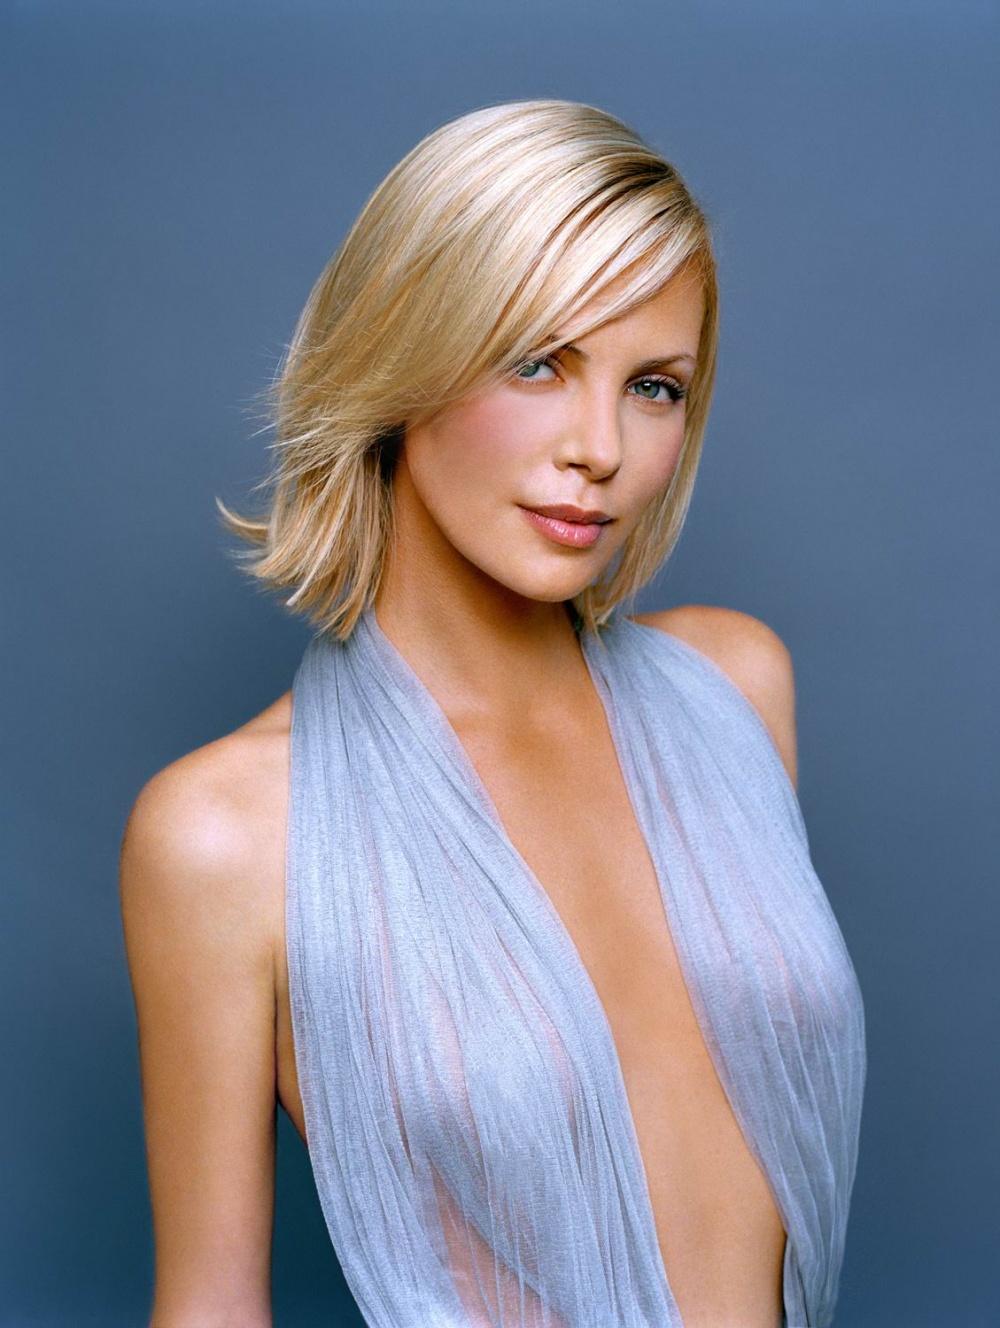 Sharon Bajer net worth